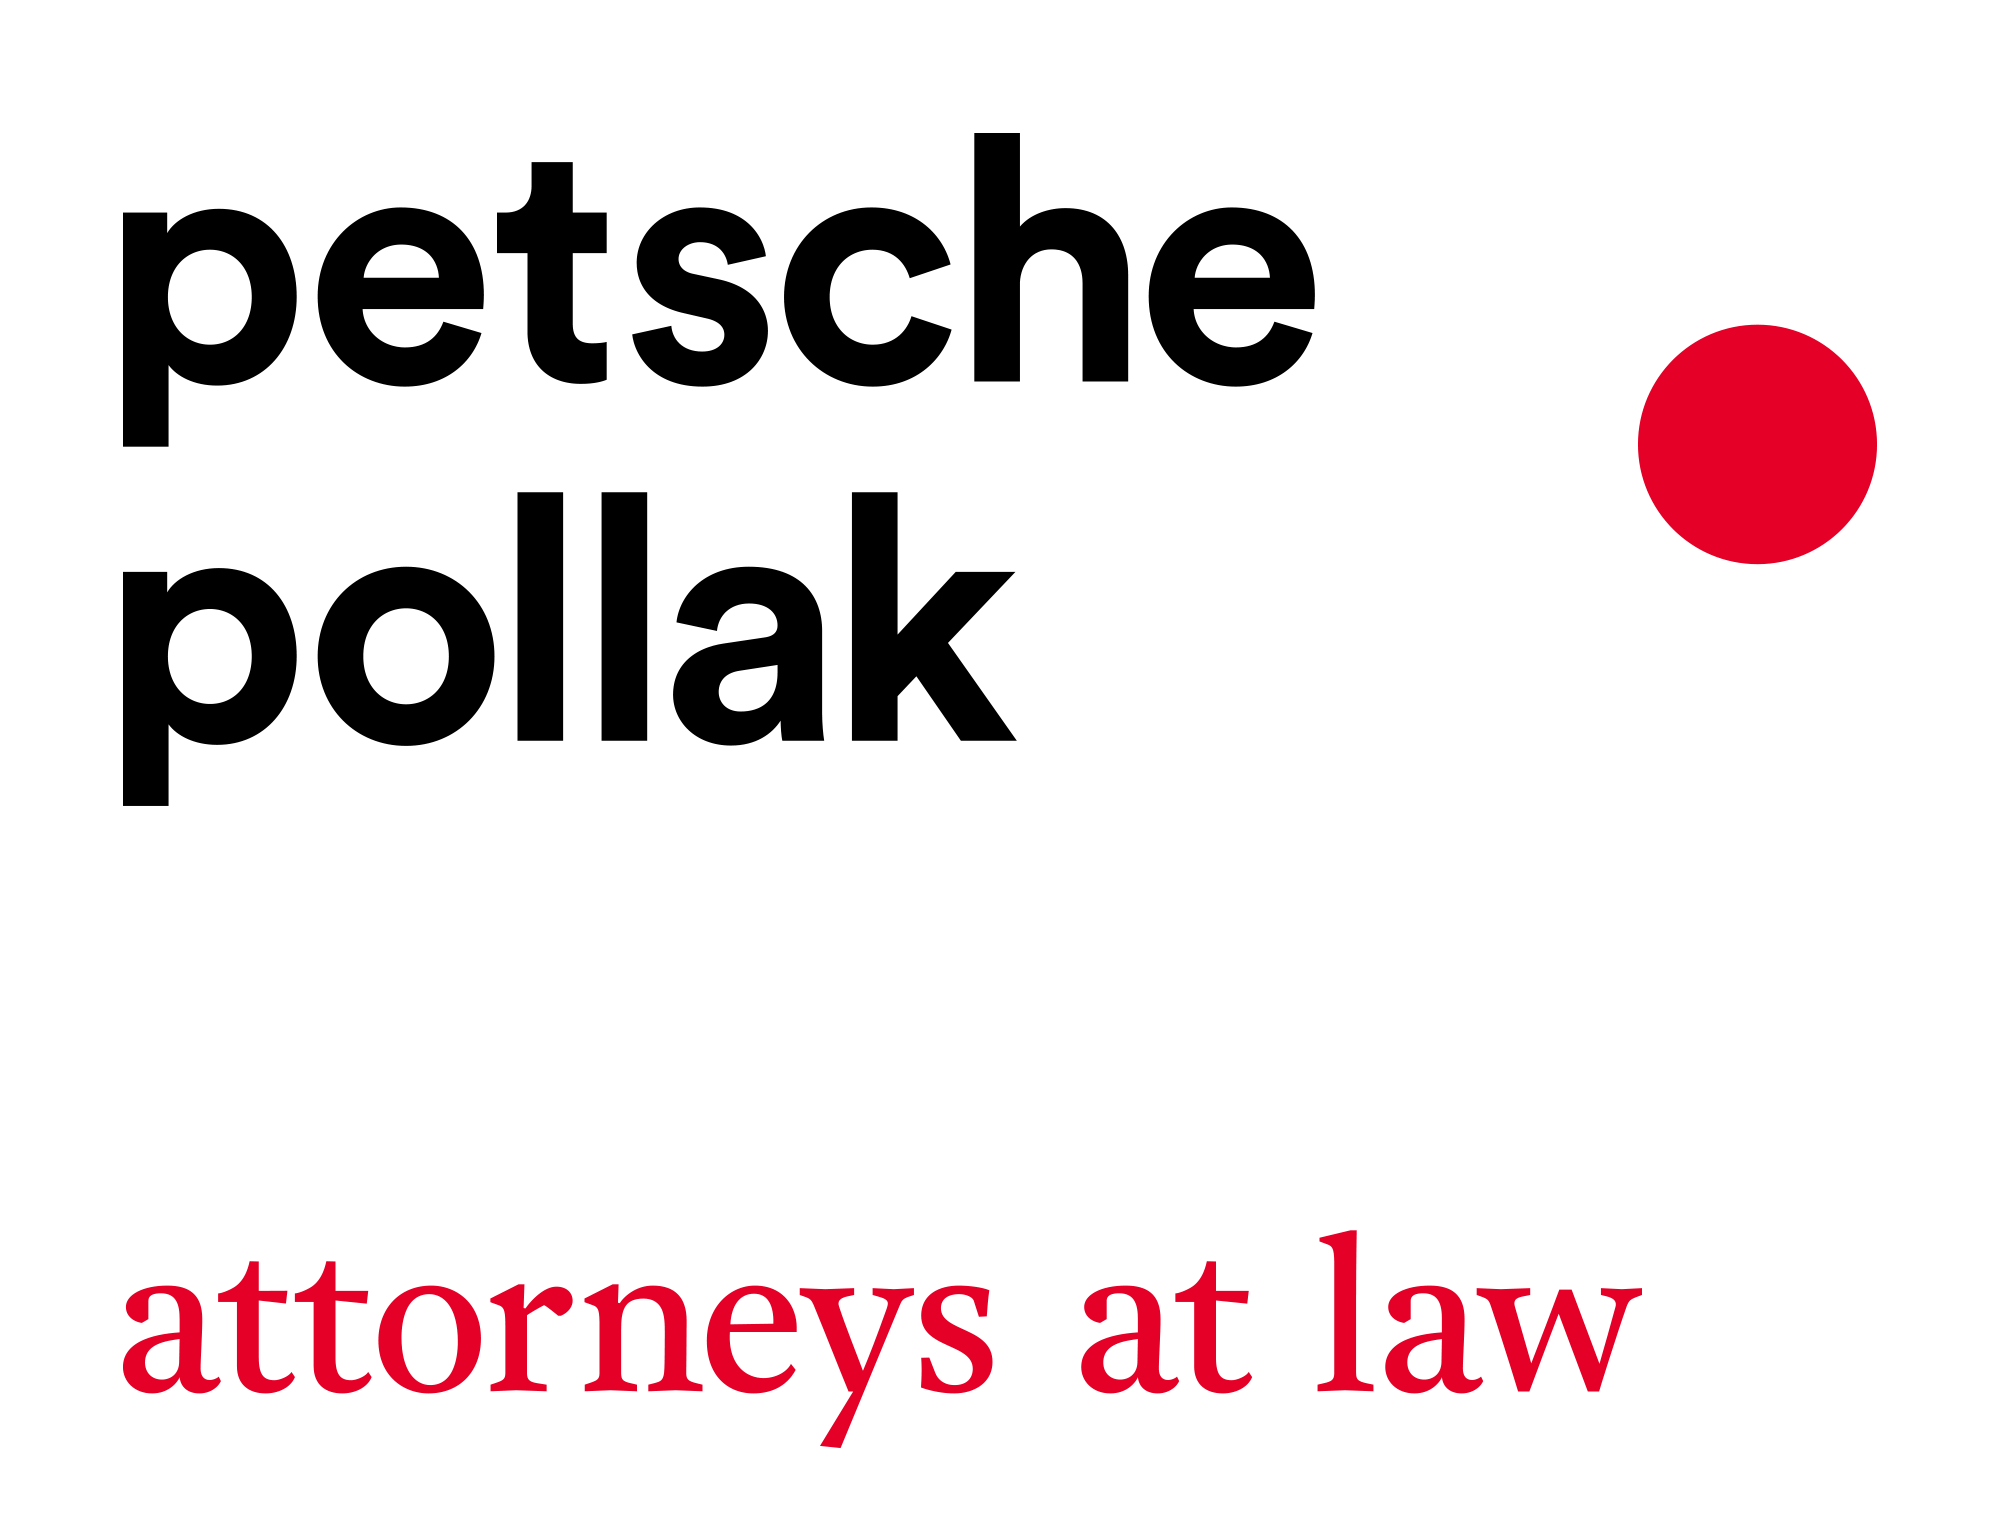 petsche pollak logo